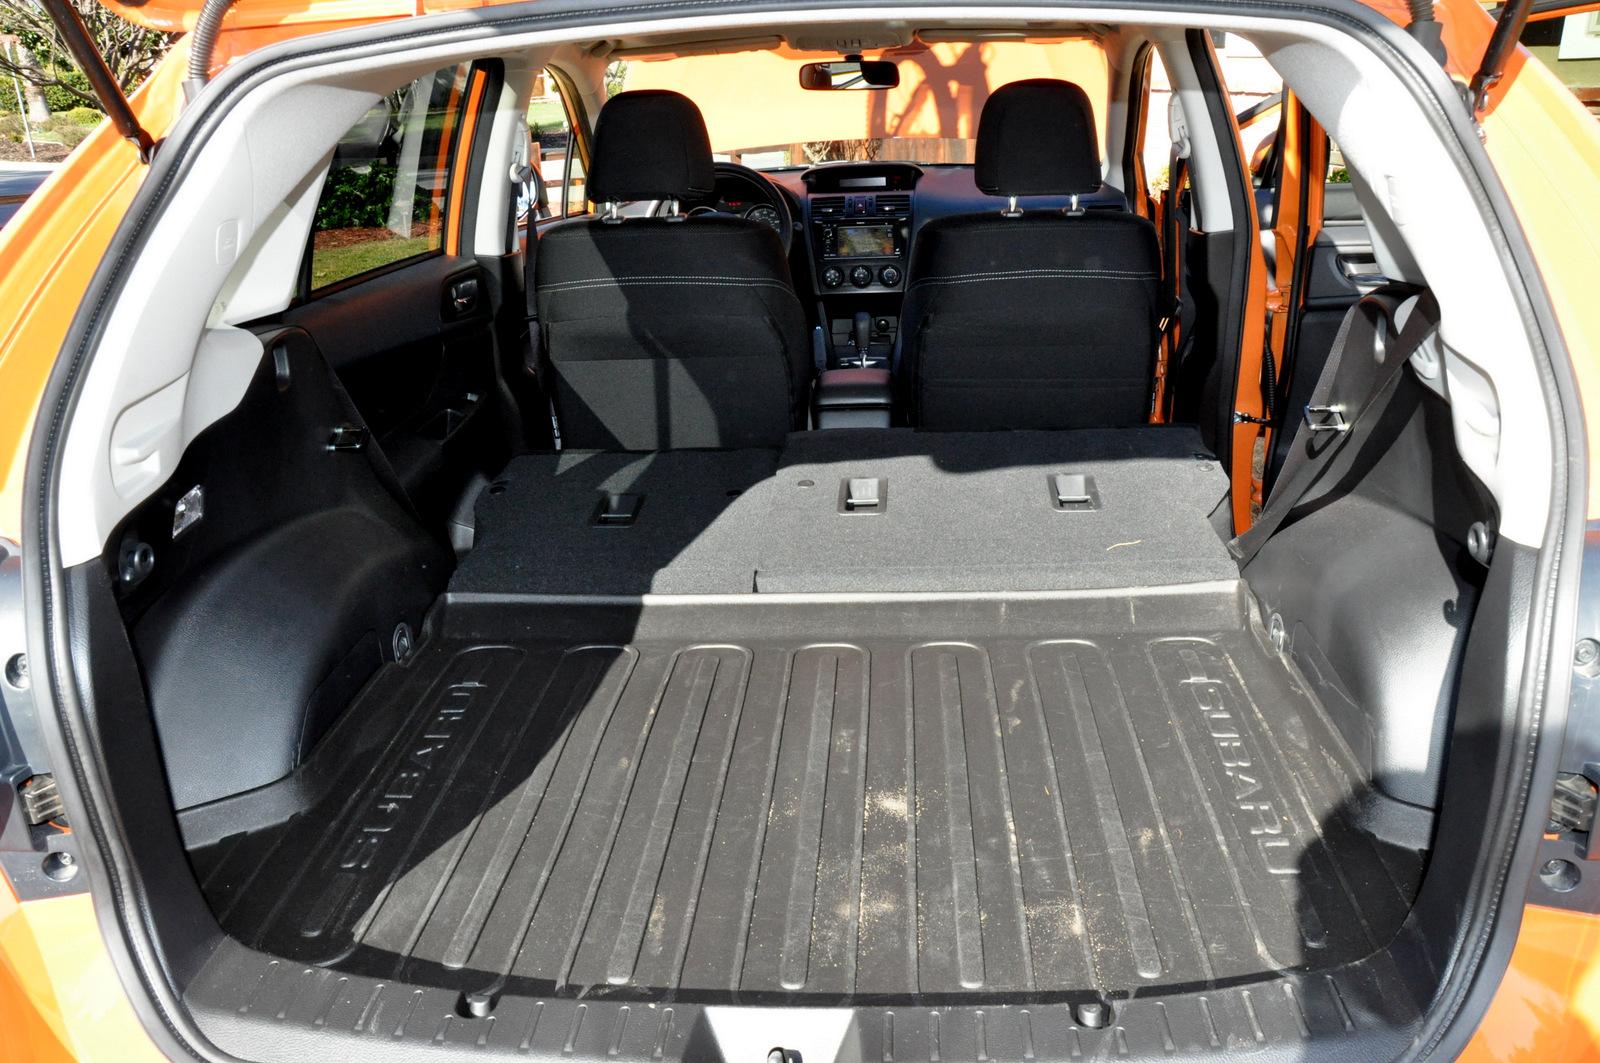 Subaru Xv Crosstrek Rear Cargo Area